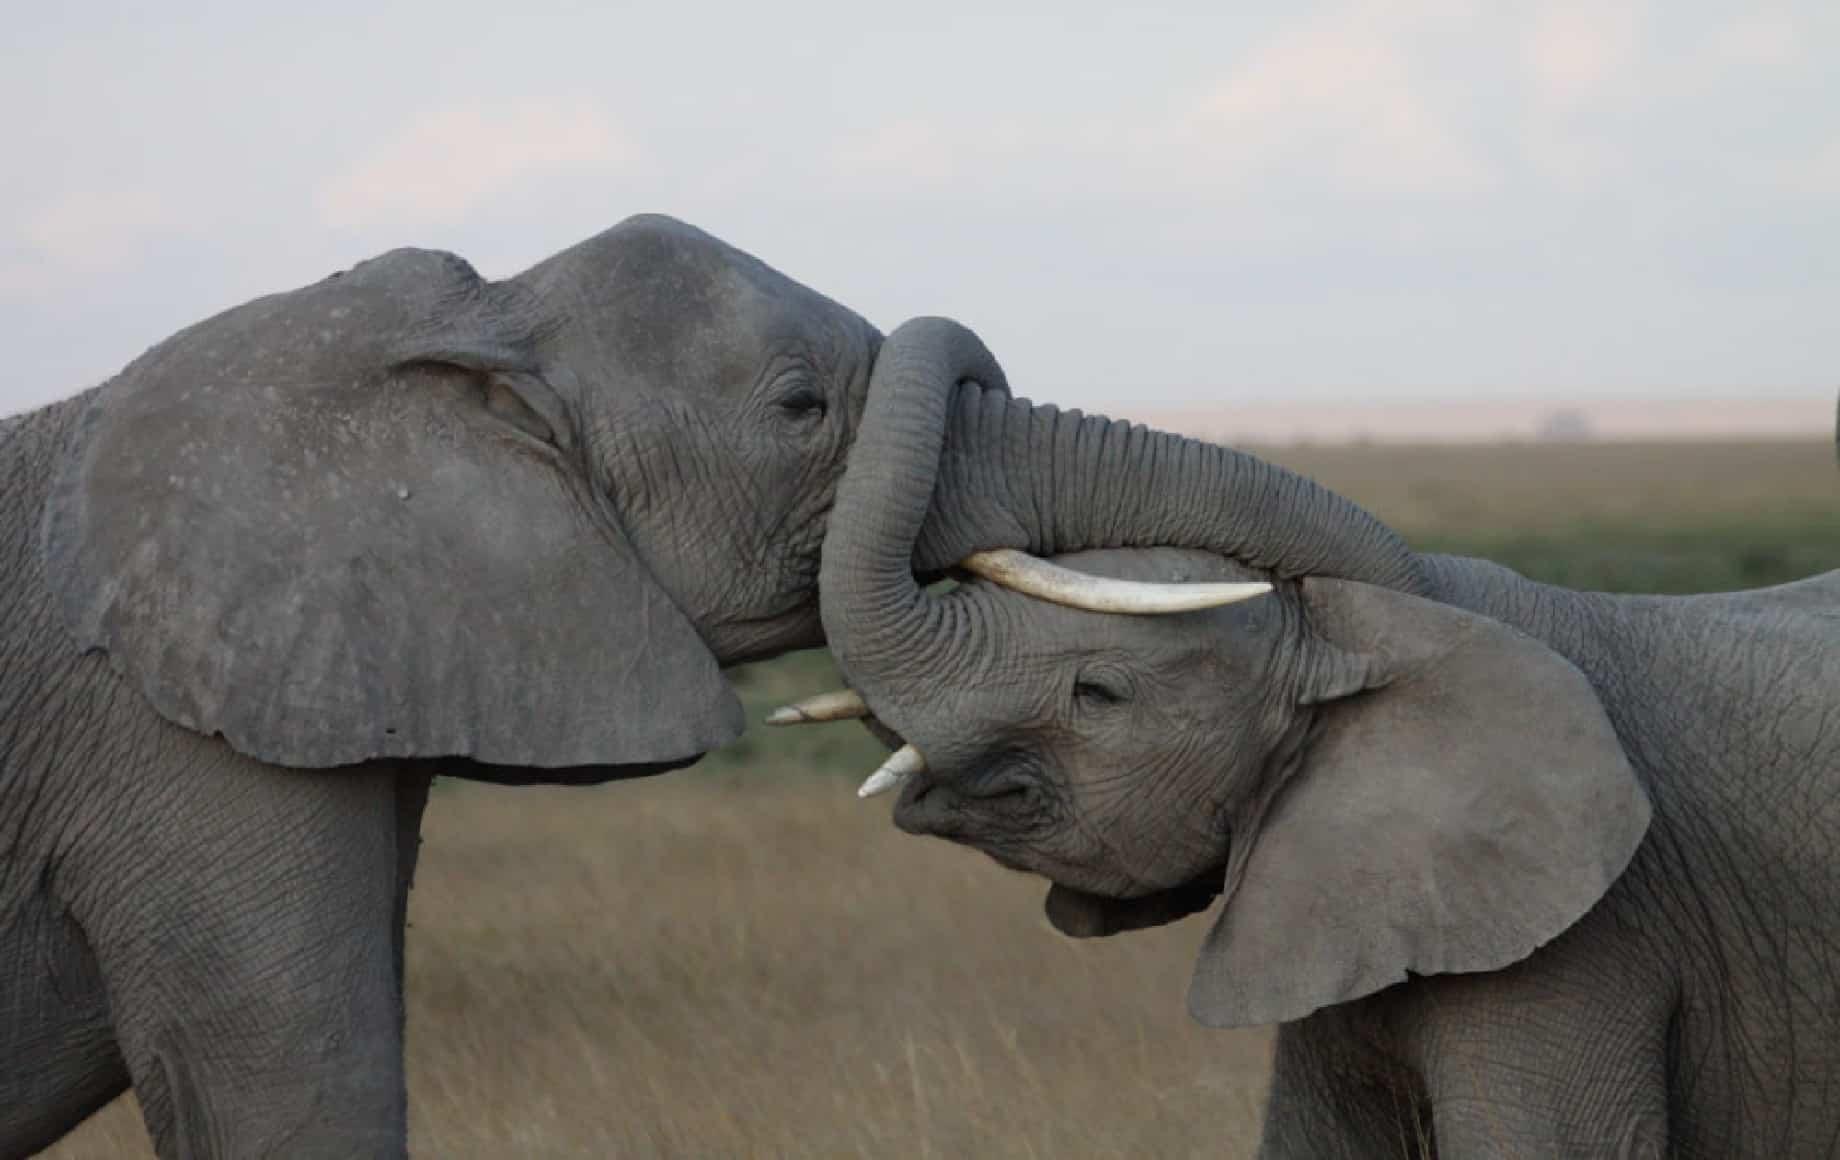 Elephants linking trunks